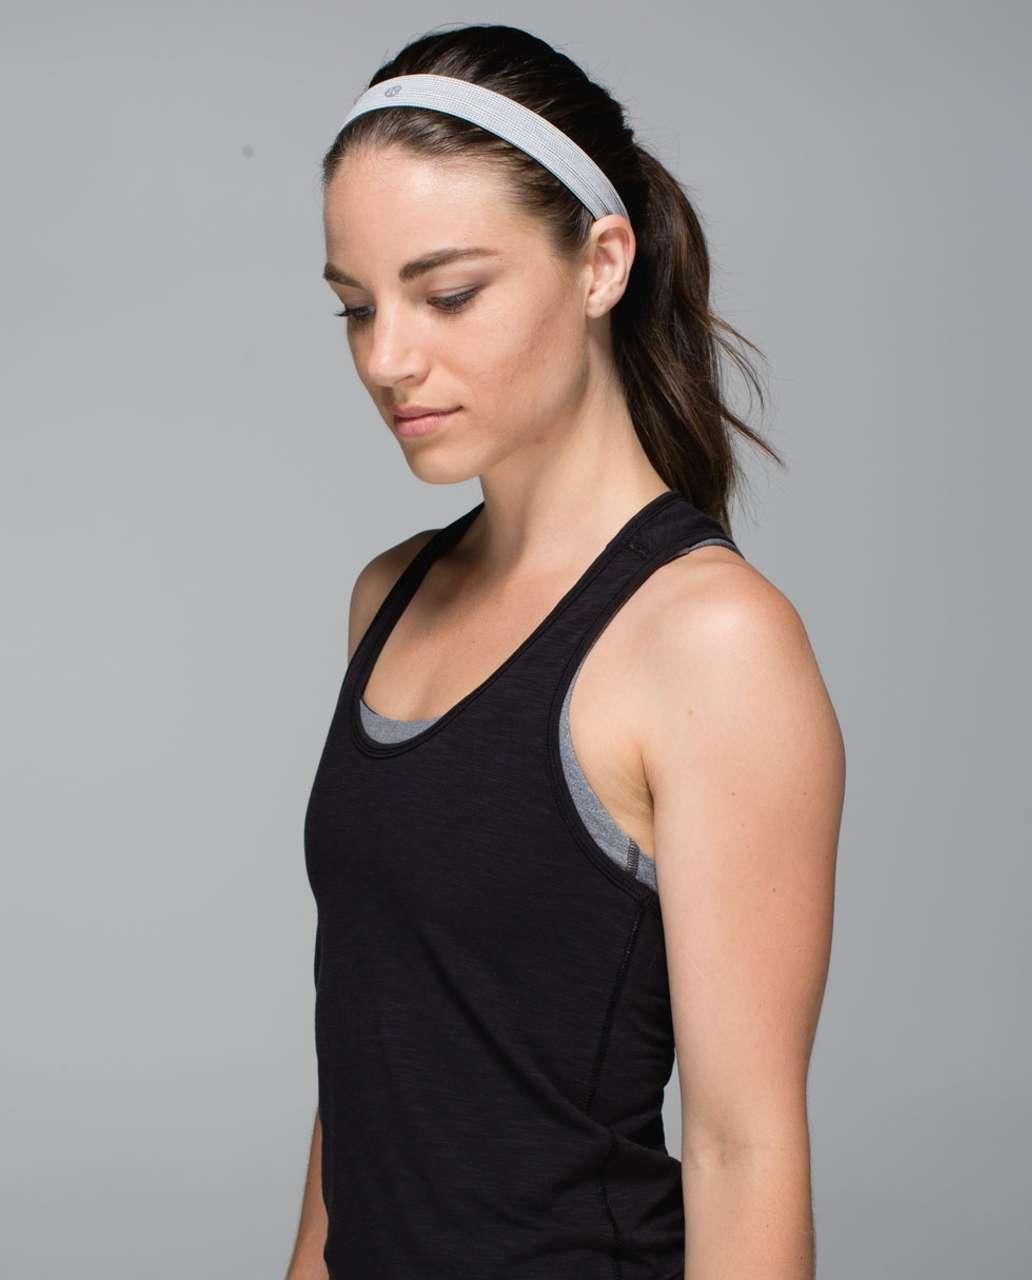 Lululemon Cardio Cross Trainer Headband - Black / Silver Fox